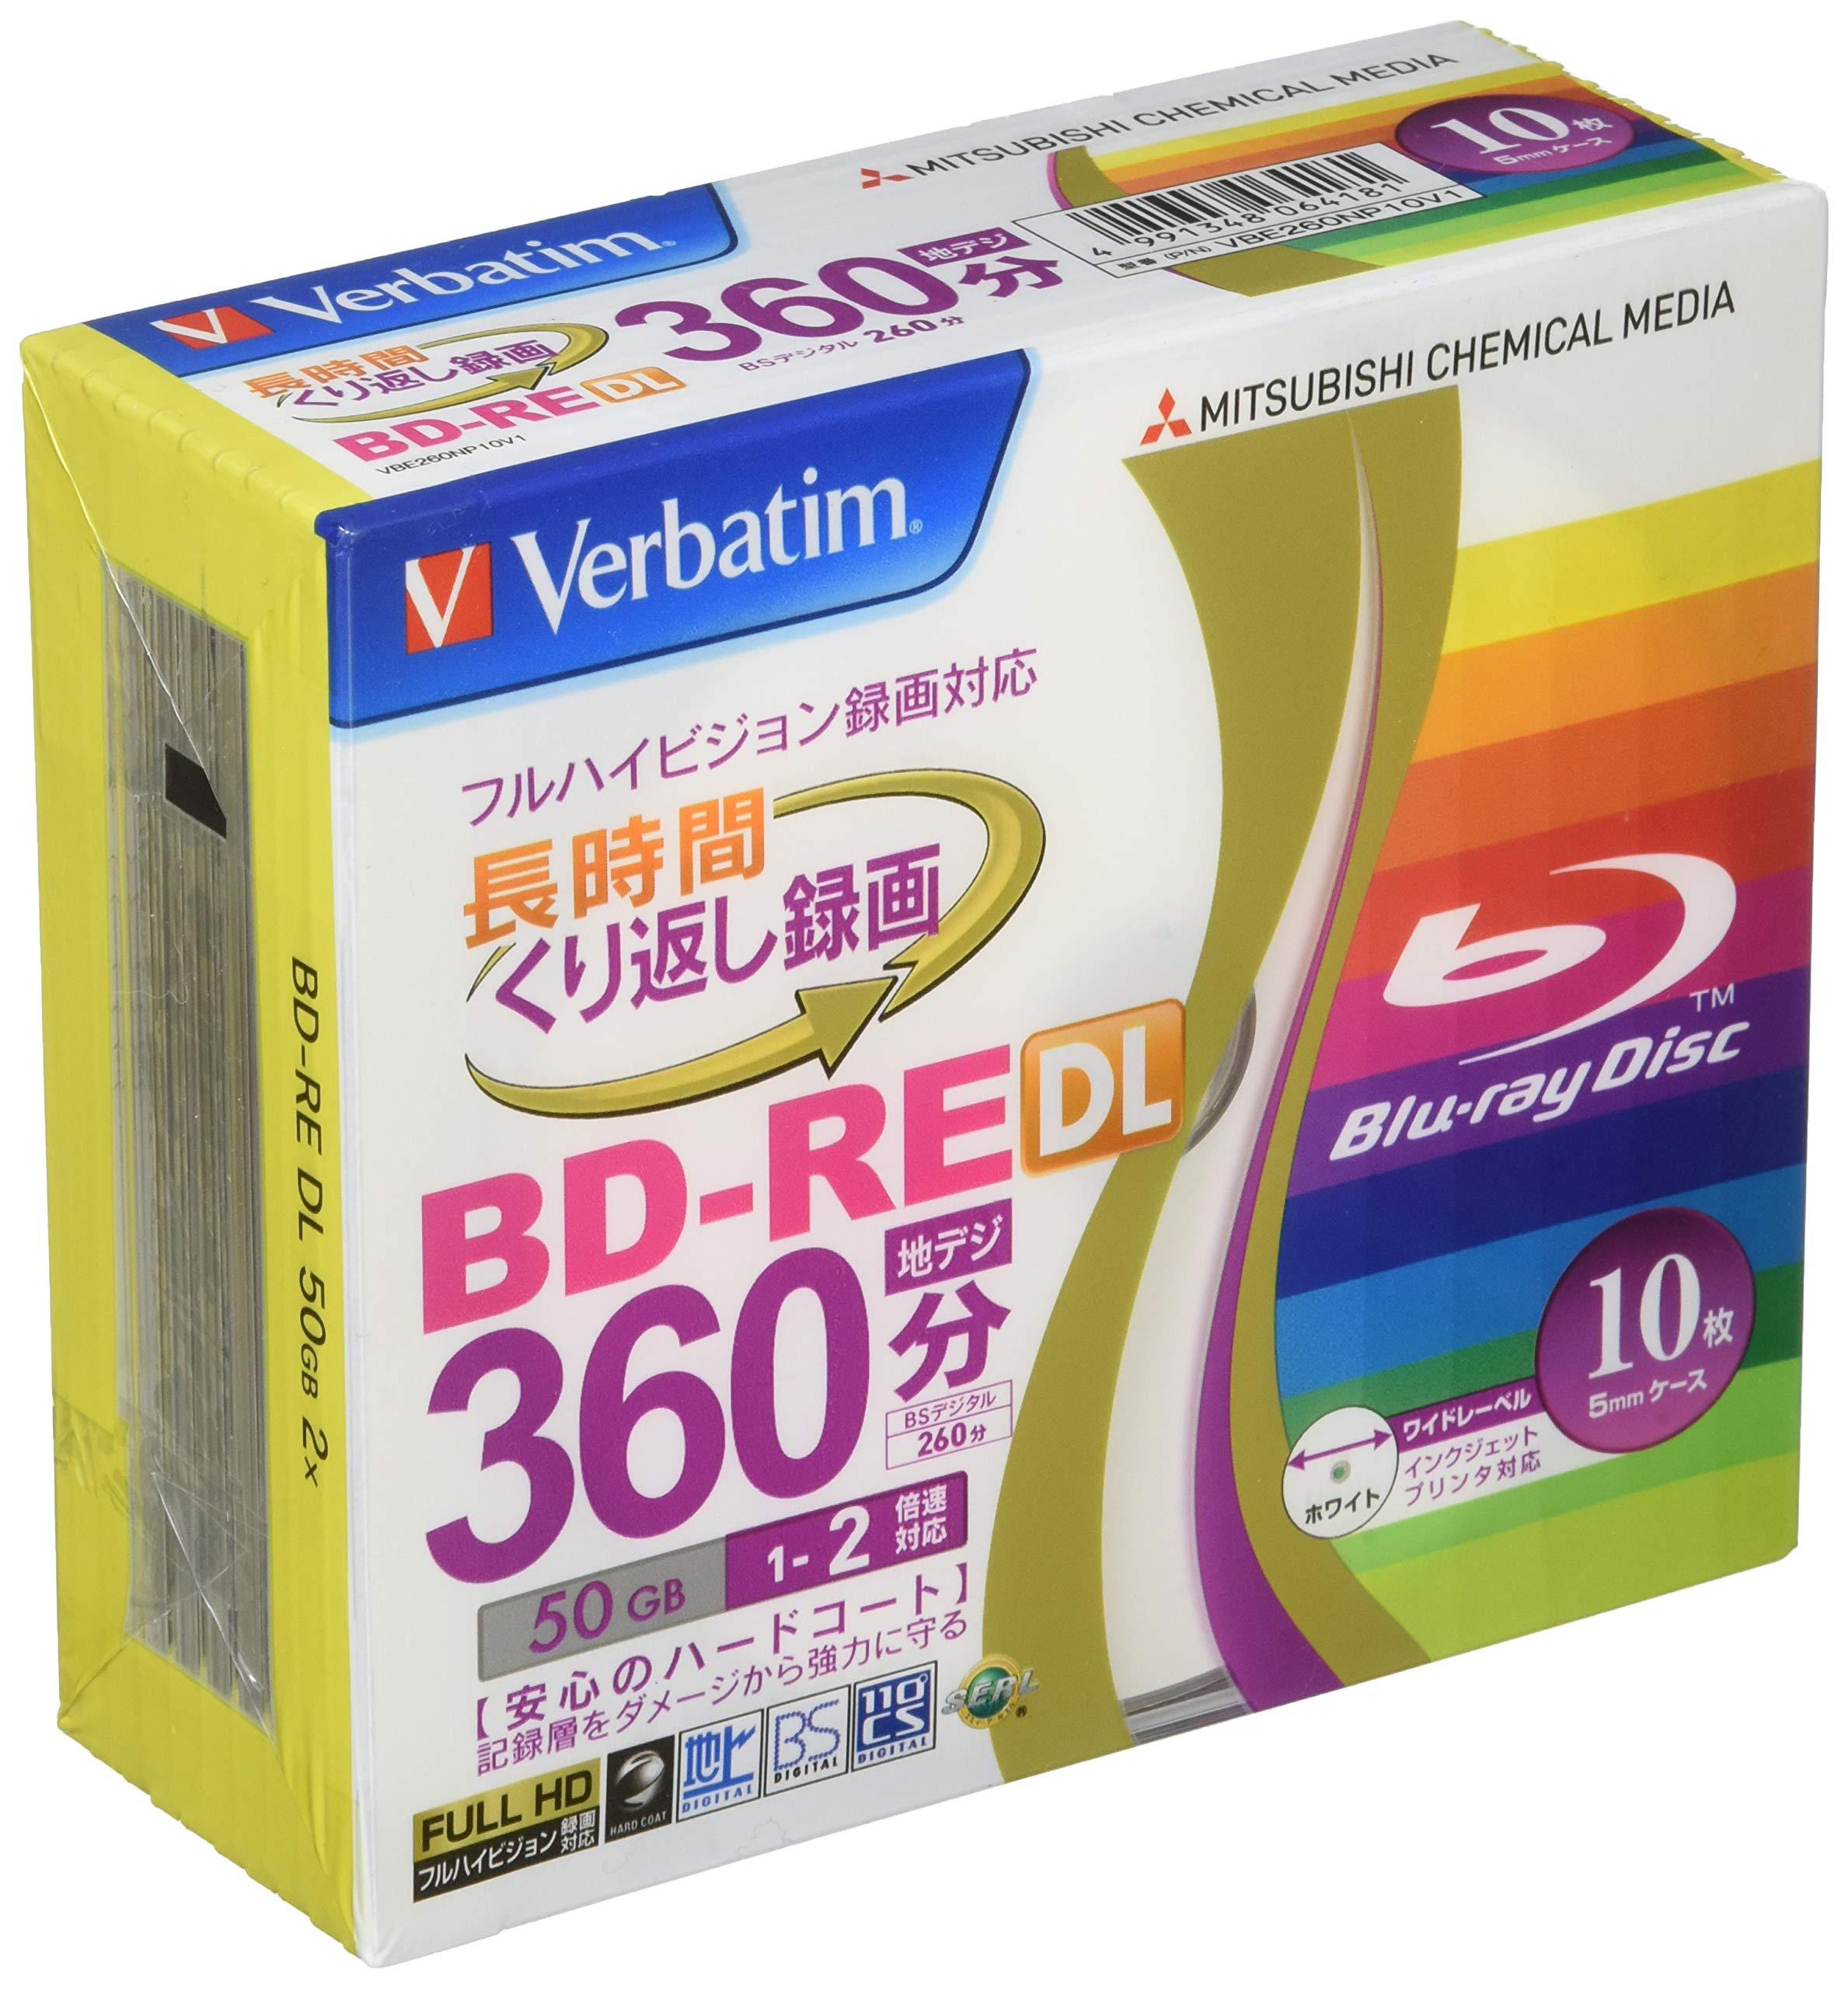 Verbatim Mitsubishi 50GB 2x Speed BD-RE Blu-ray Re-Writable Disk 10 Pack - Ink-jet printable - Each disk in a jewel case